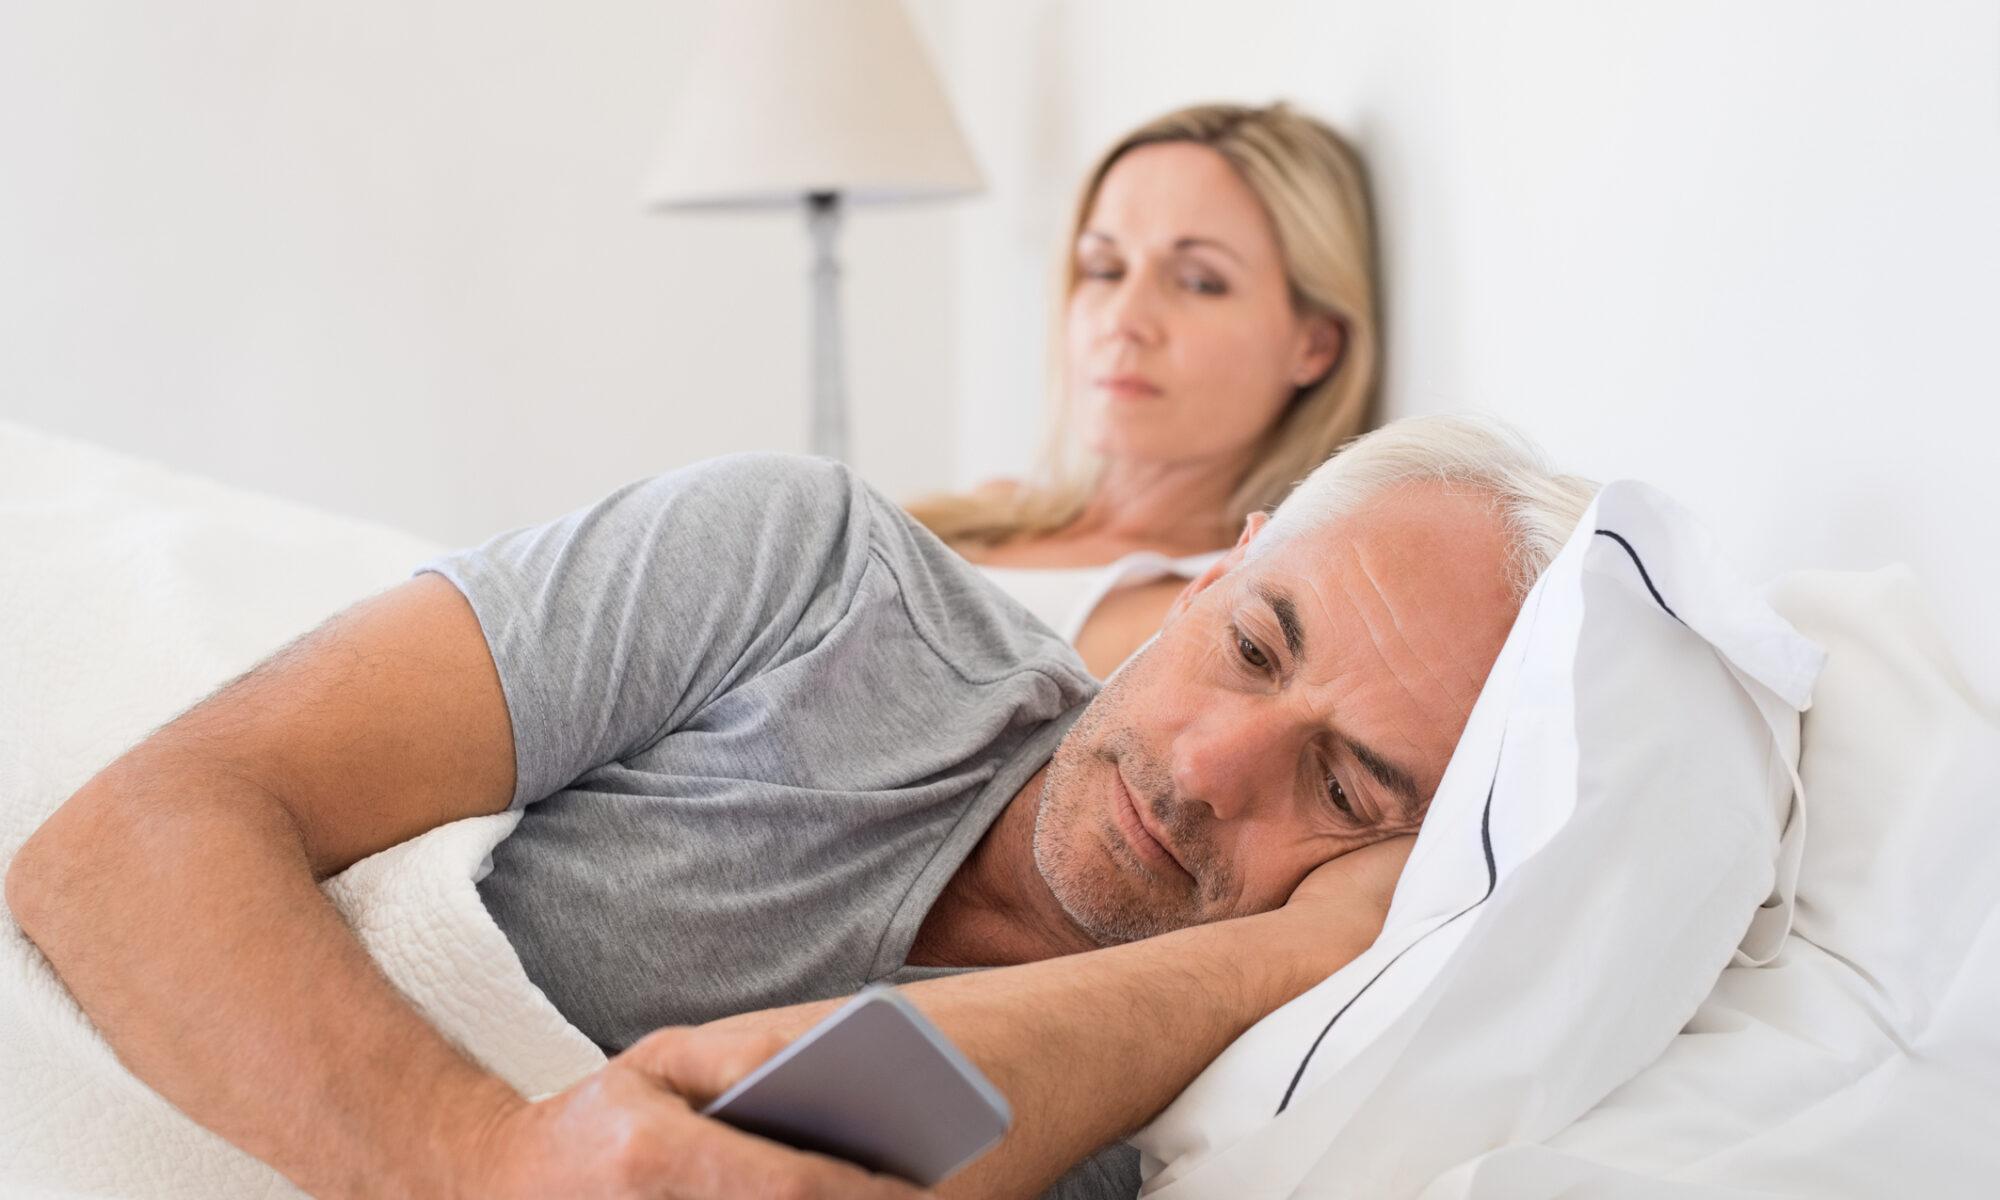 Frau beobachtet Mann im Bett, der heimlich am Handy ist